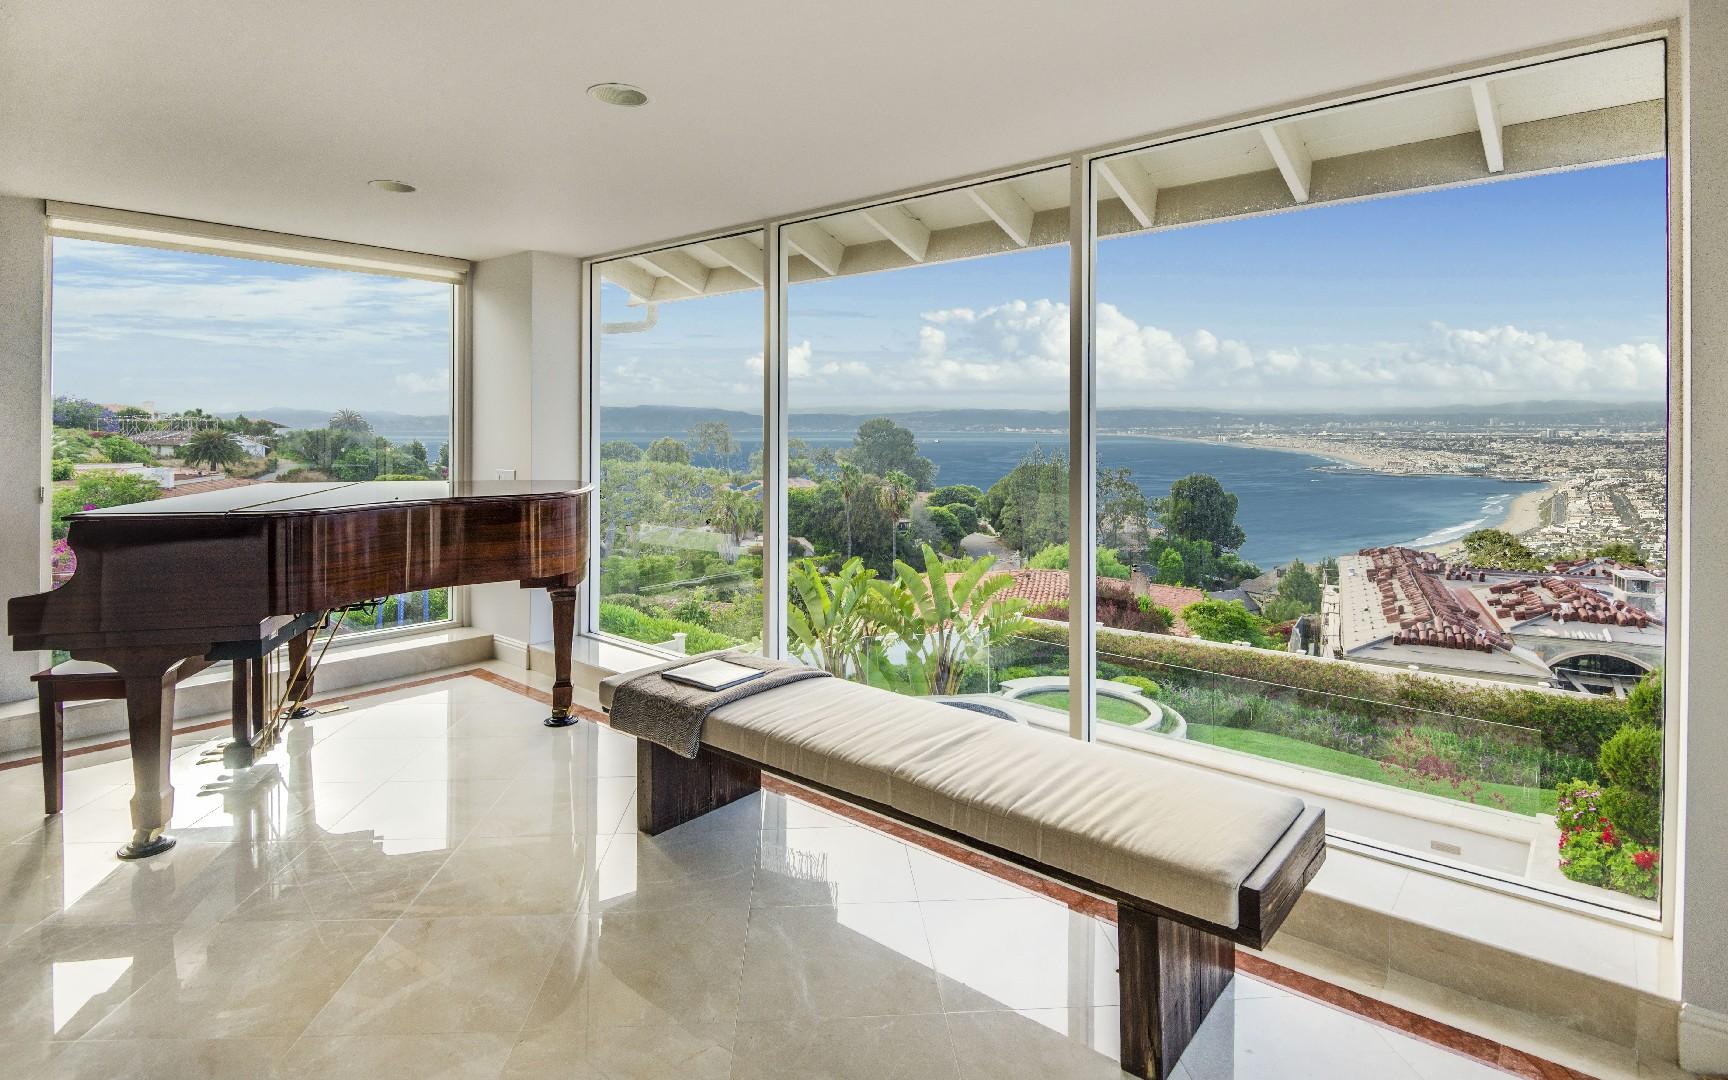 Single Family Home for Sale at 932 Via Del Monte, Palos Verdes Estates 90274 Palos Verdes Estates, California 90274 United States